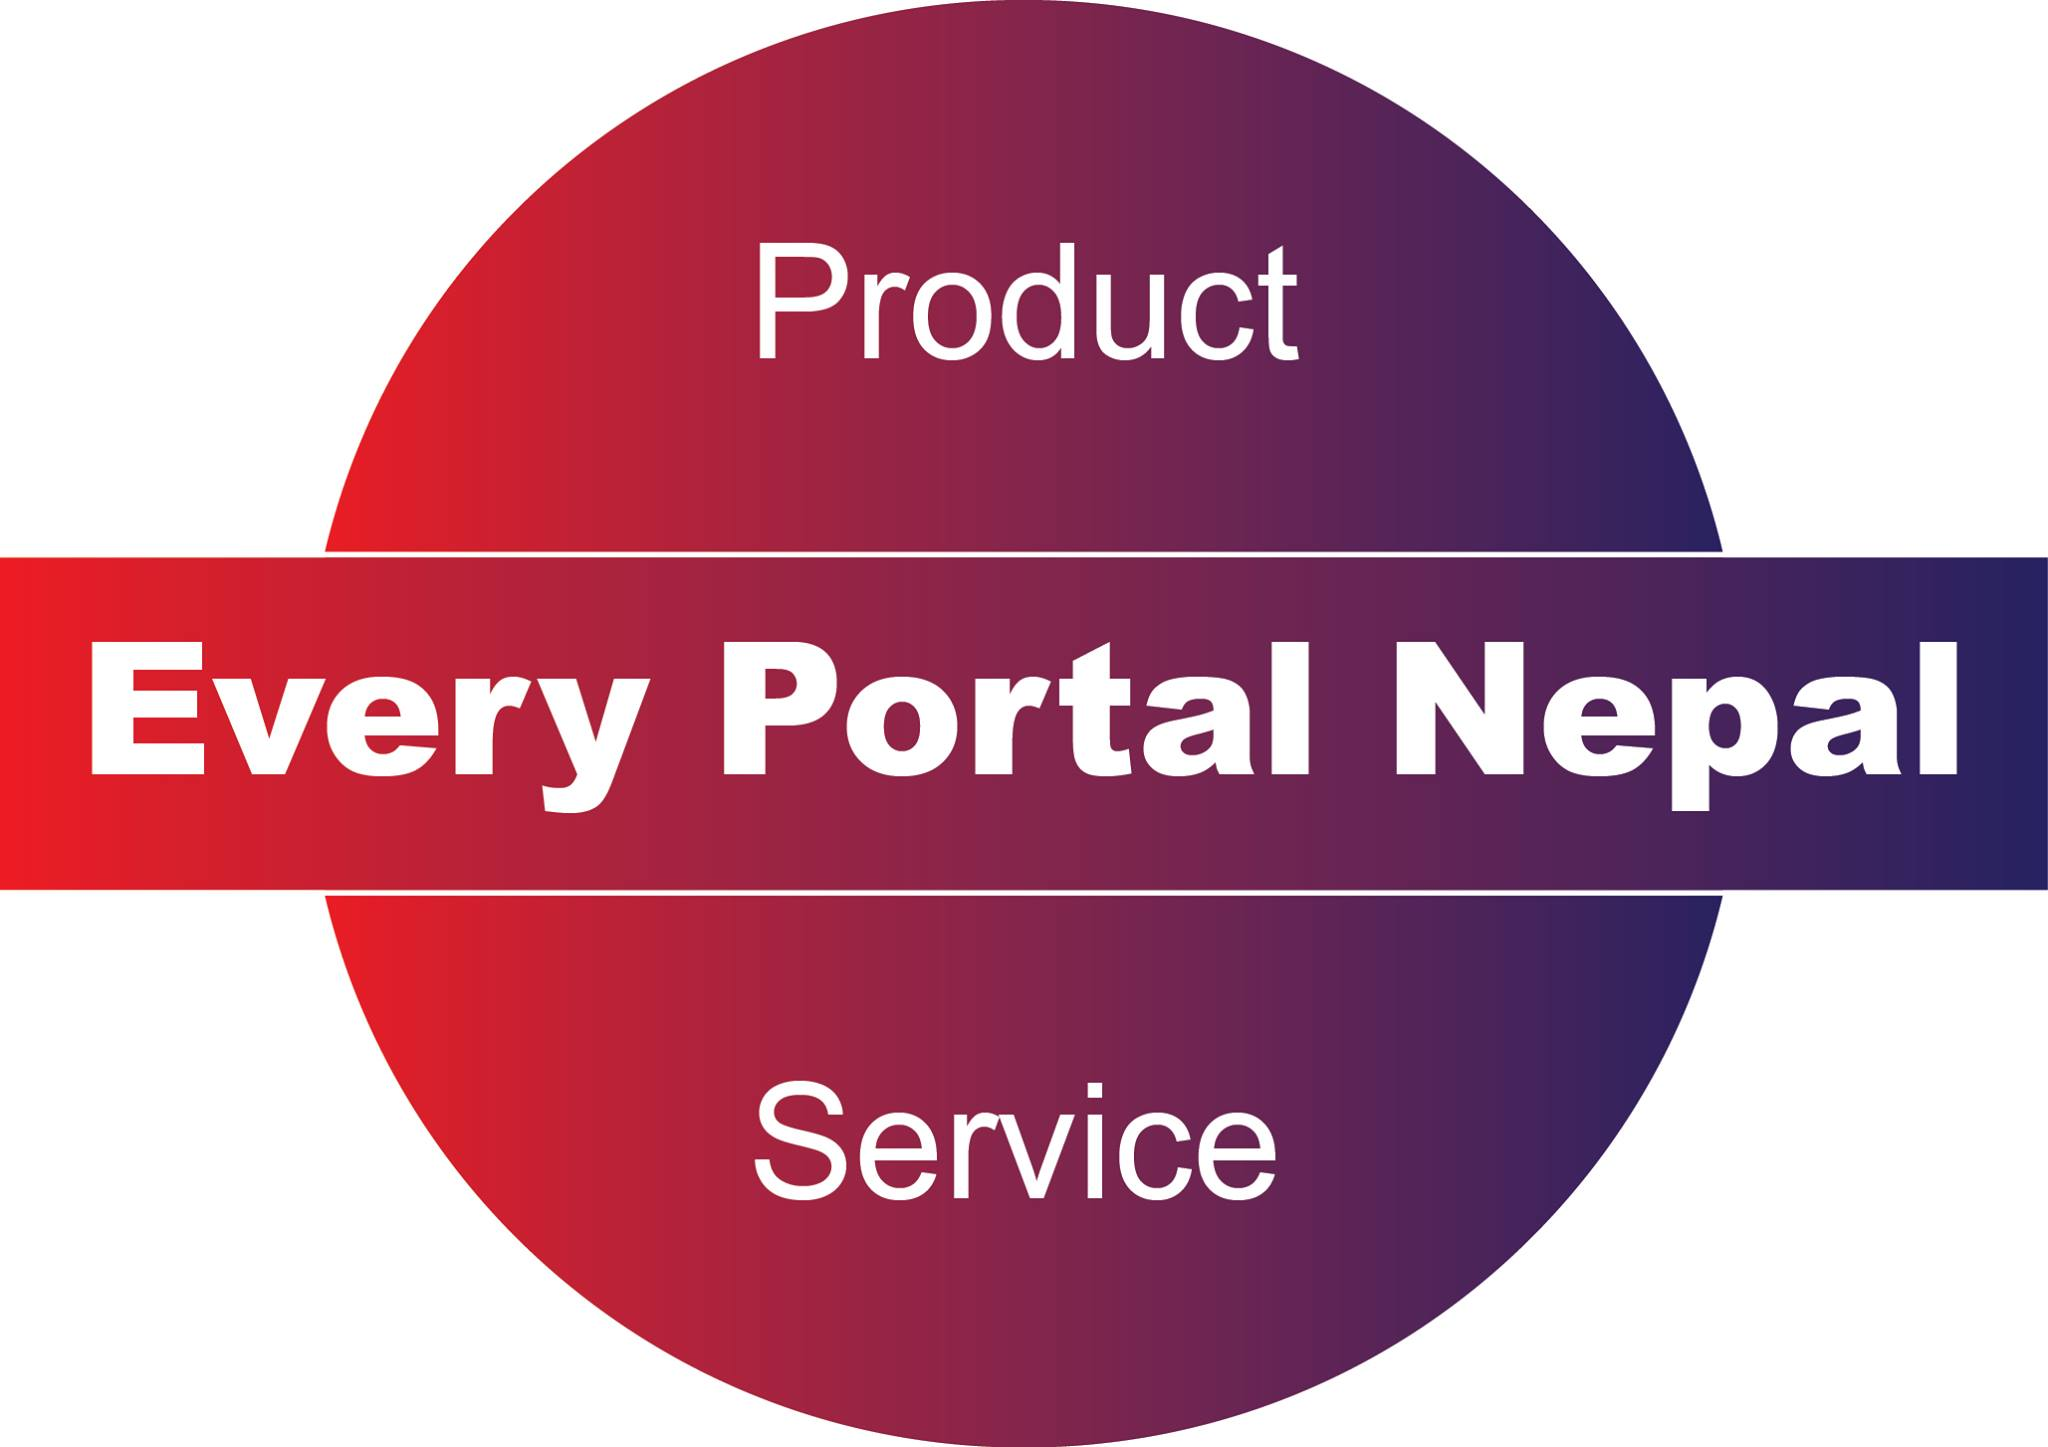 Every Portal Nepal